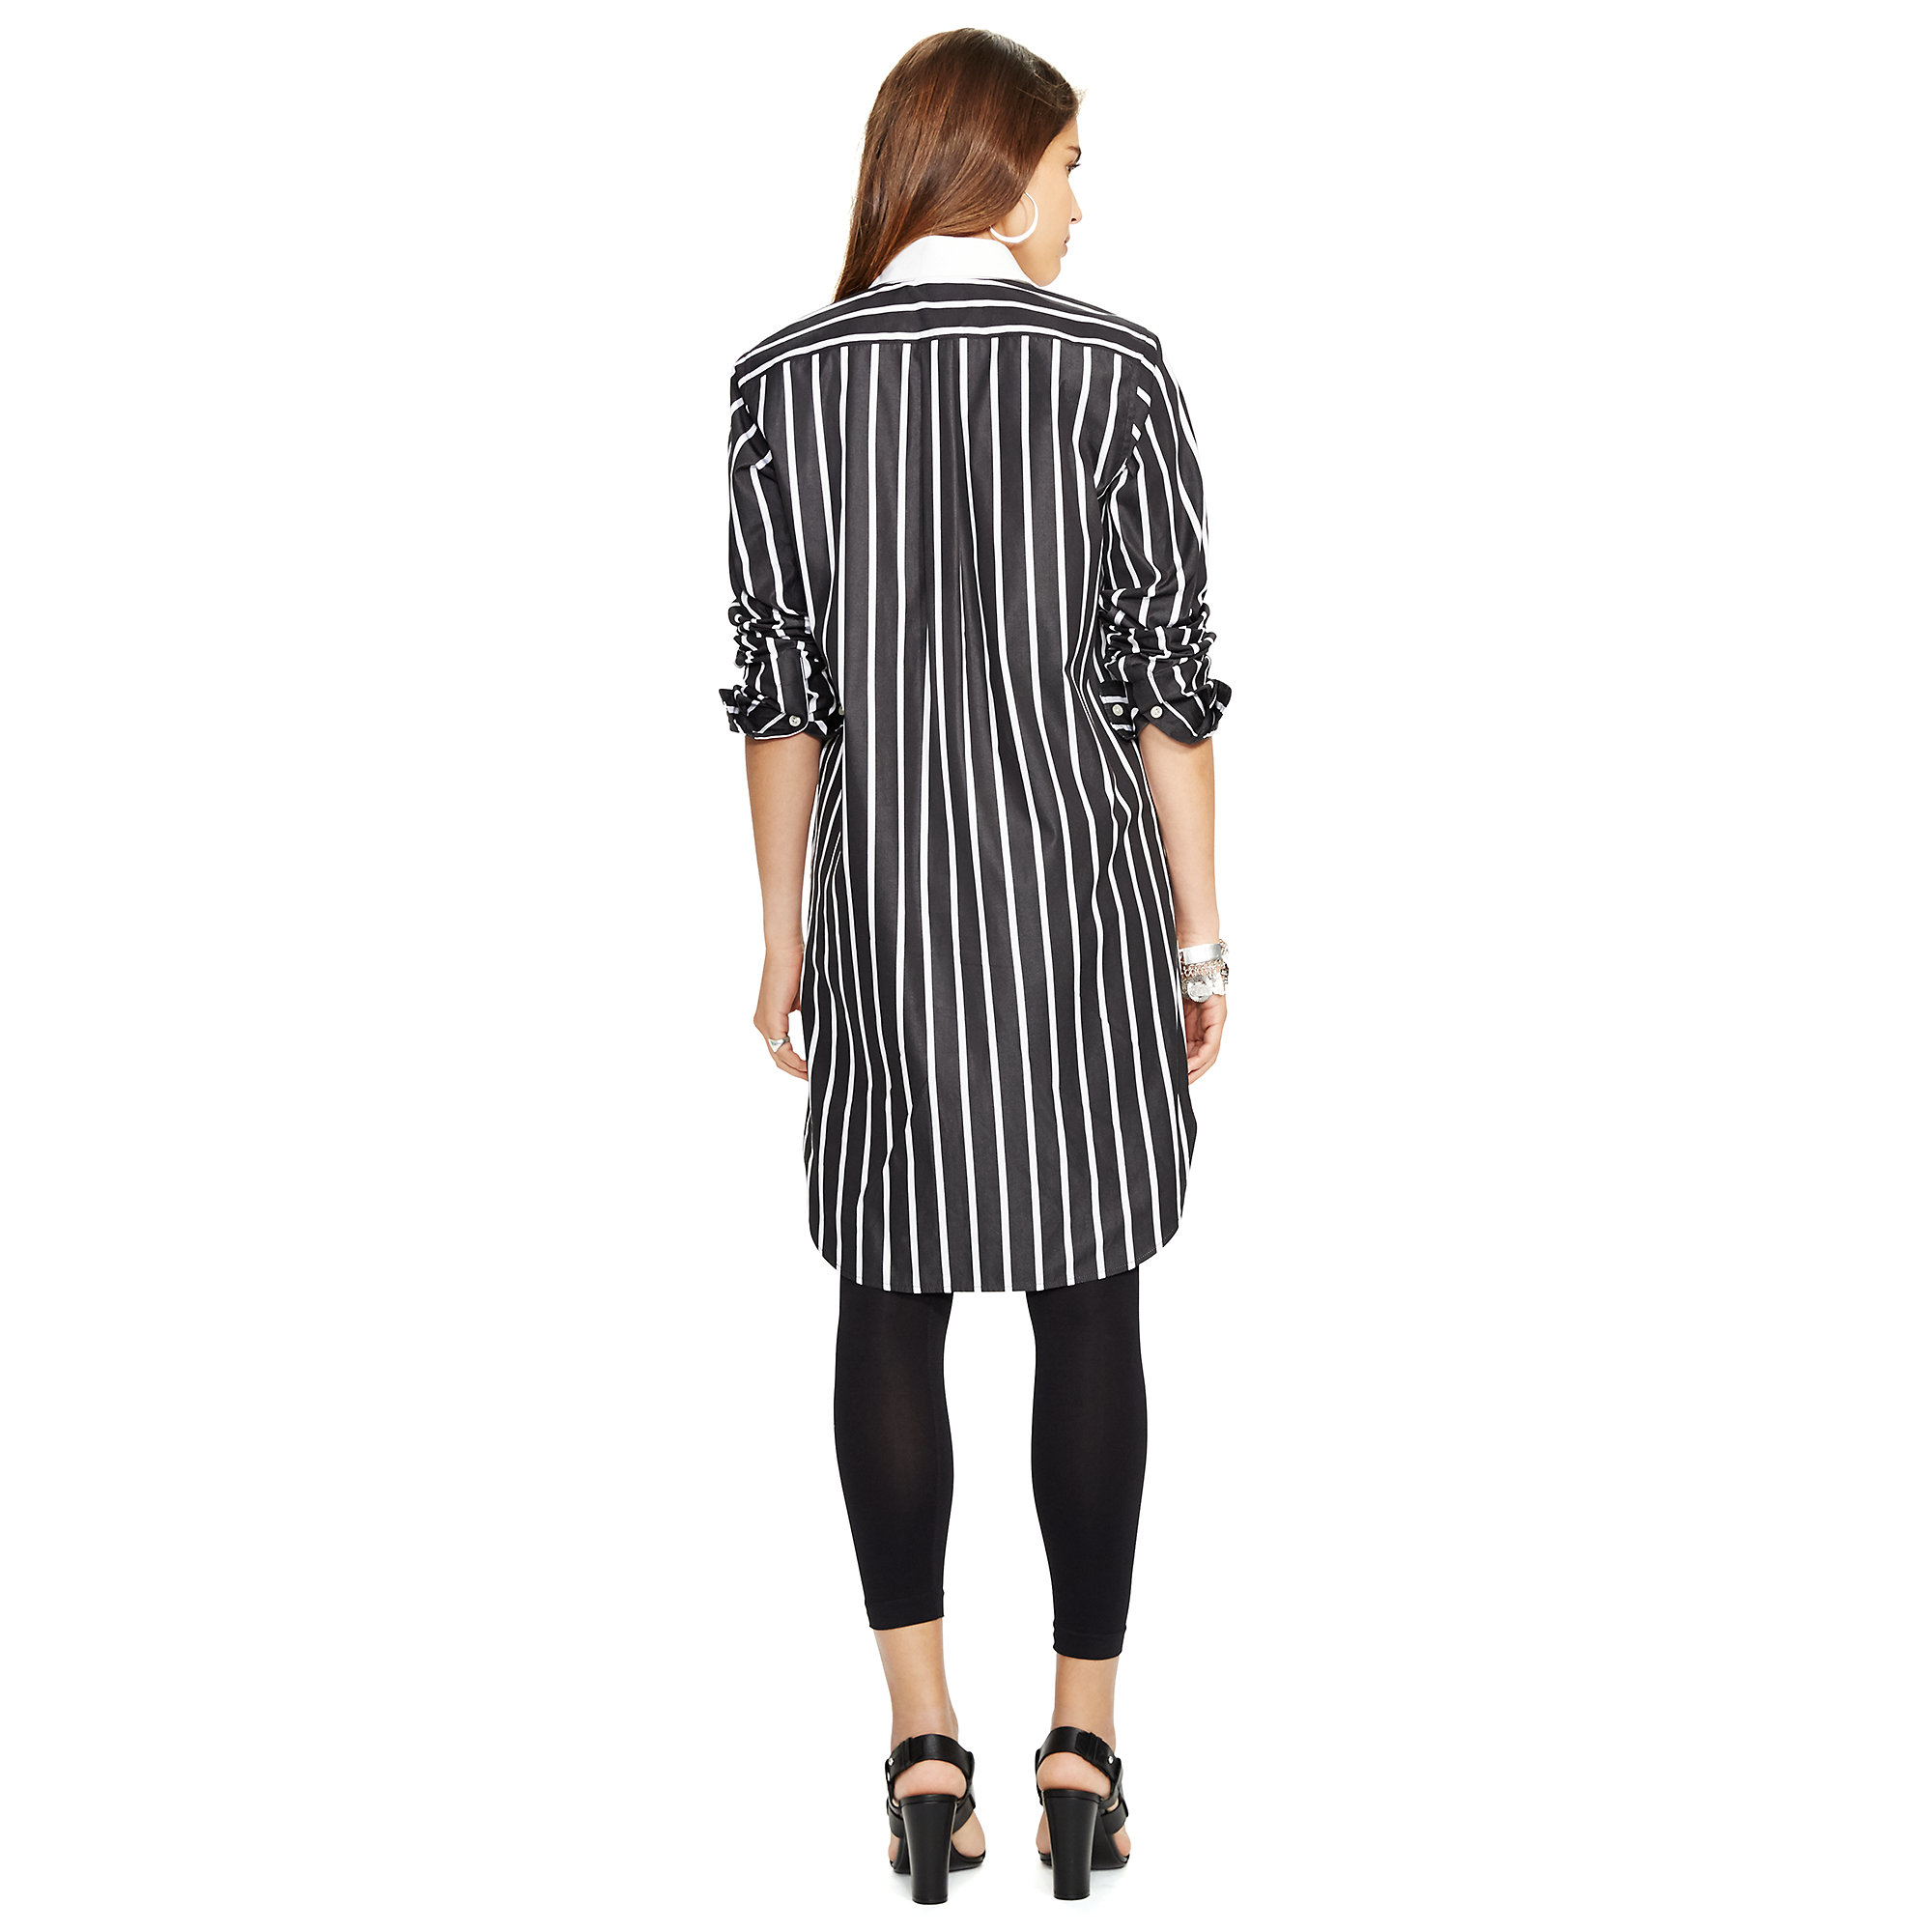 1513582ec28 Polo Ralph Lauren Black And White Striped Dress Shirt